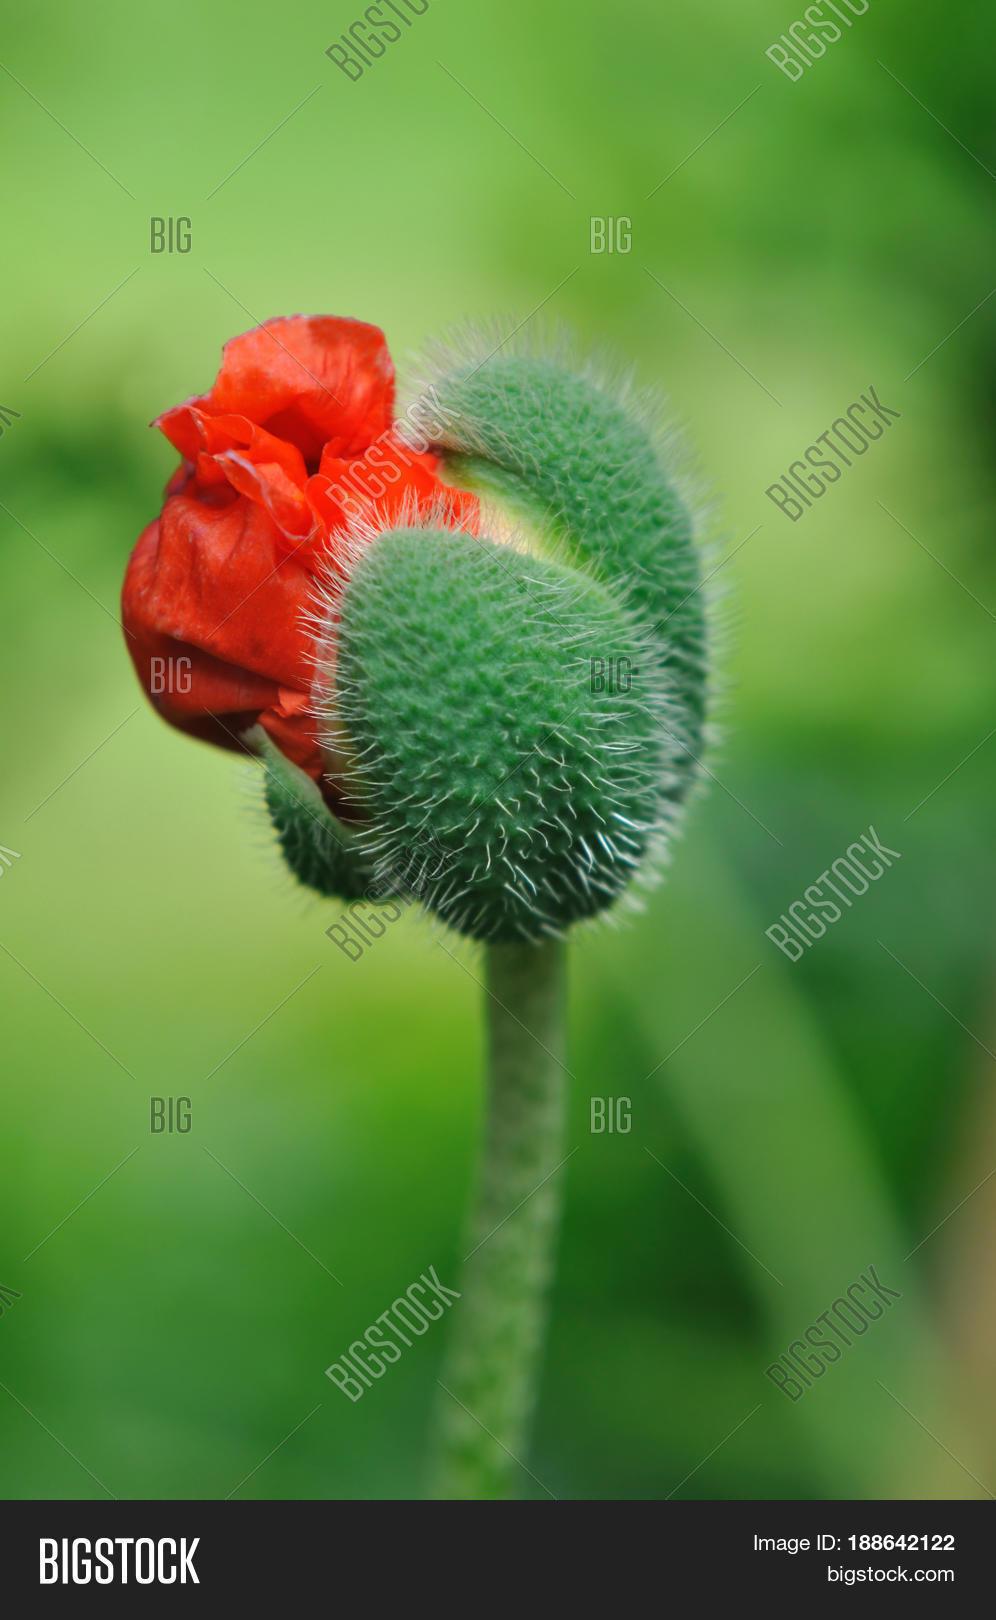 Flowering Poppy Flower Image Photo Free Trial Bigstock